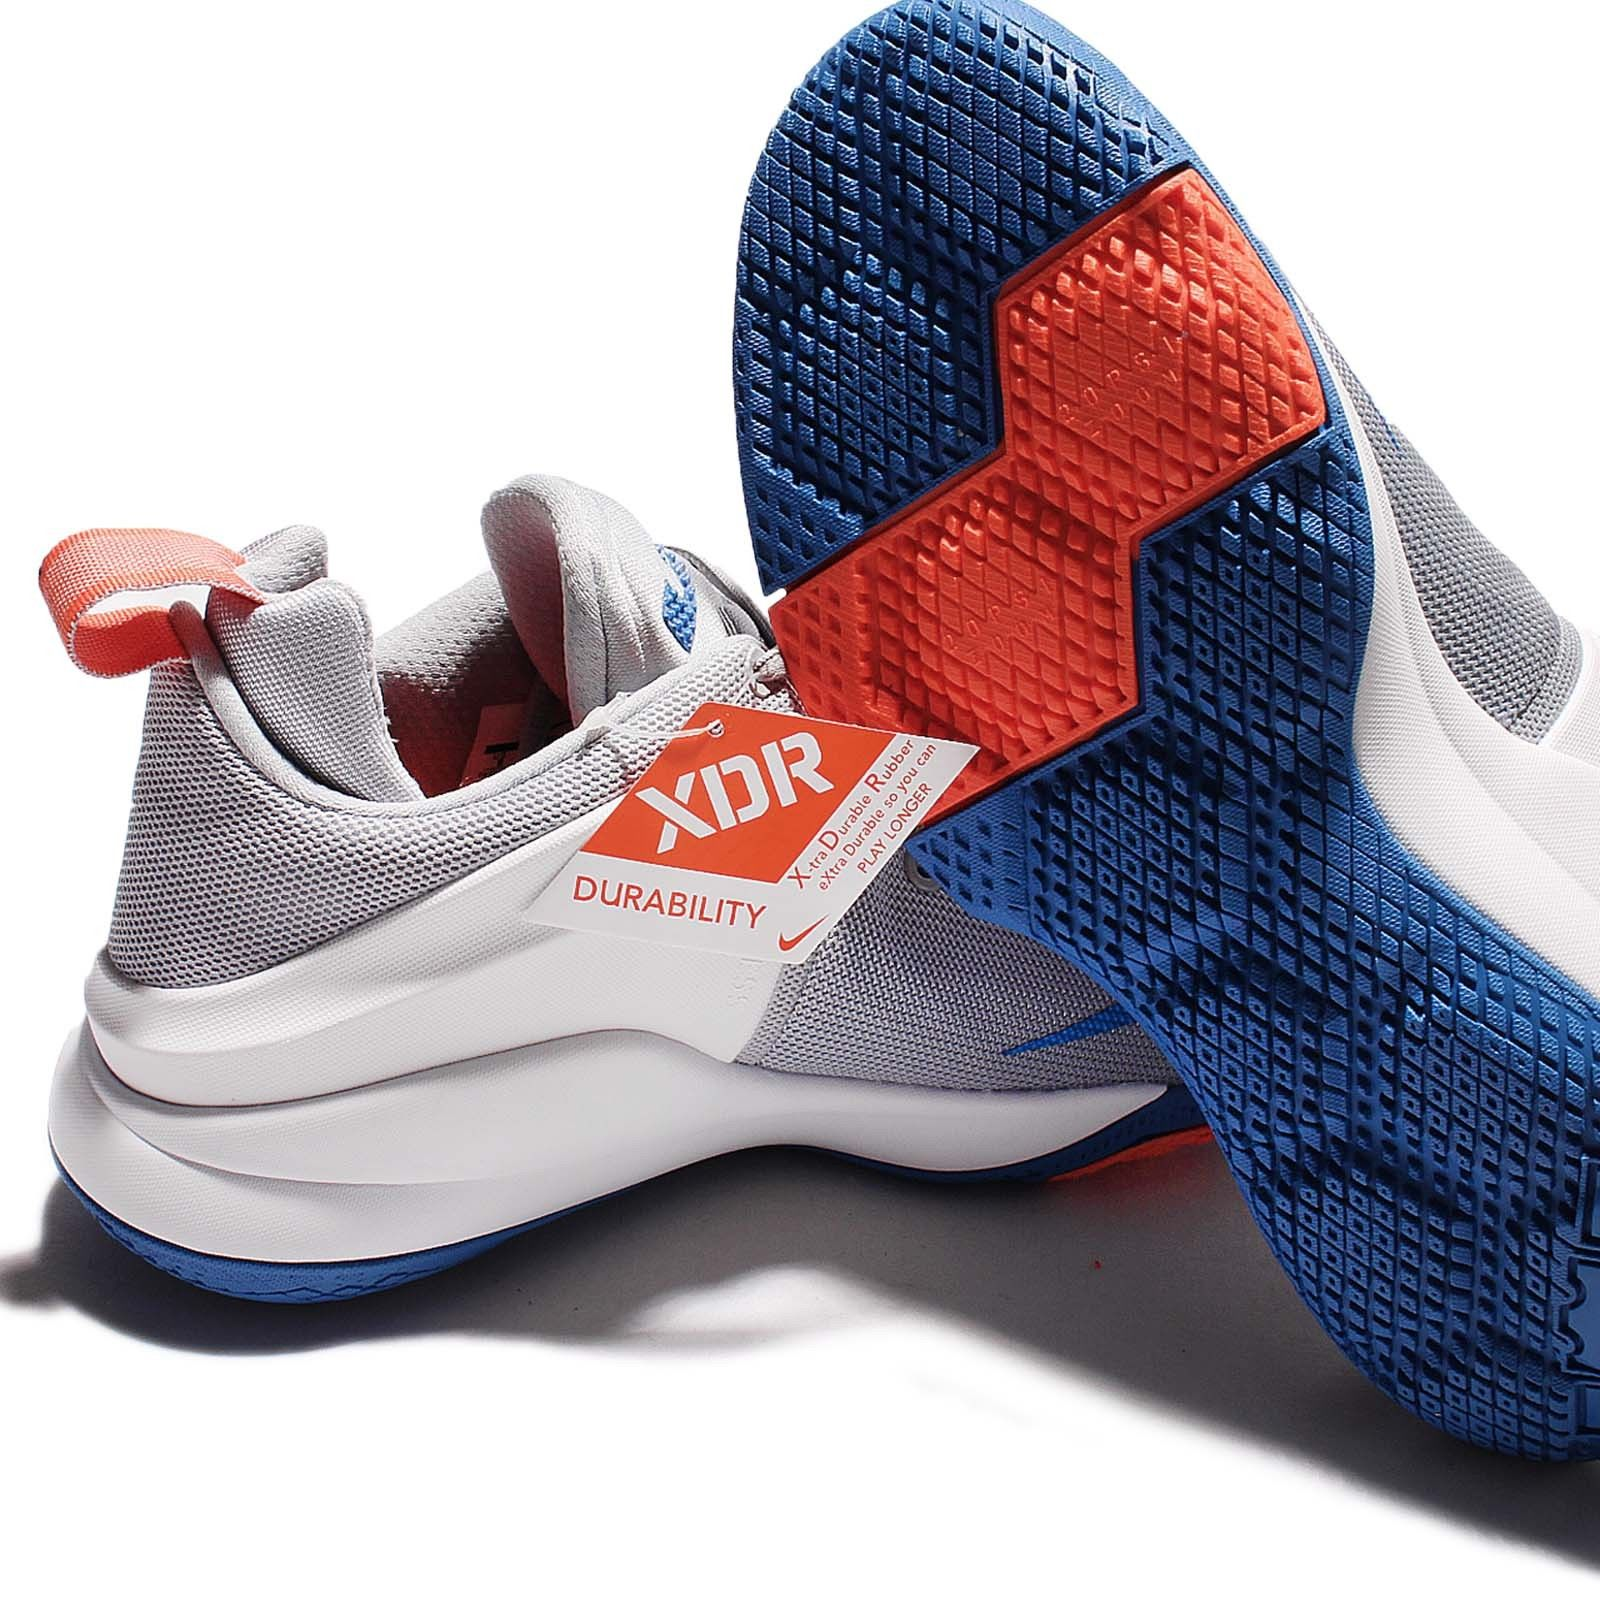 8b298e30be7 Nike zoom witness grey weartesters jpg 1600x1600 Nike xdr shoes